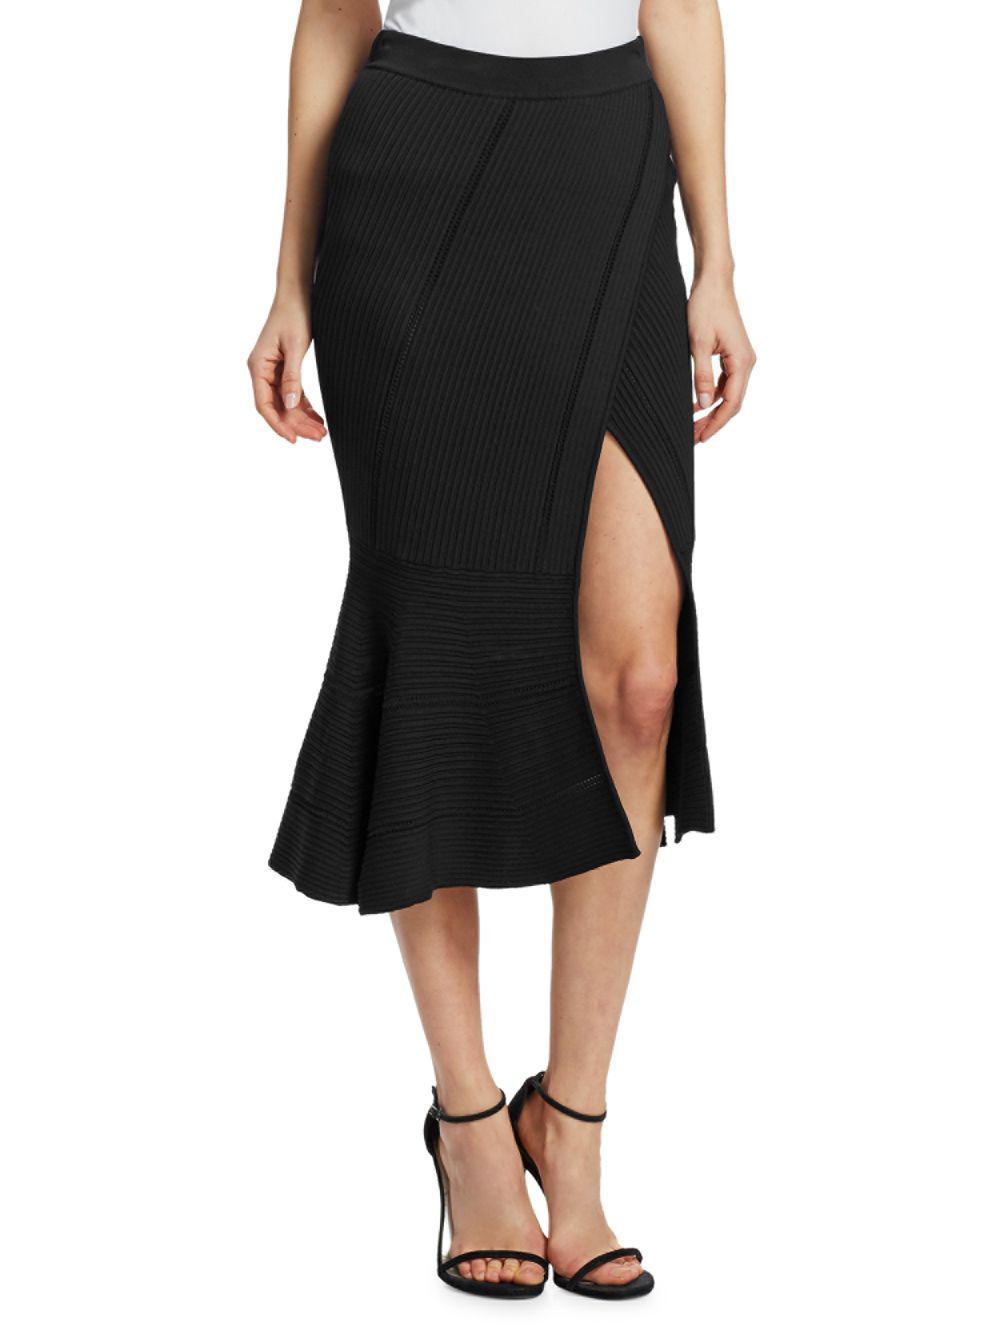 54f4e93f14 Jonathan Simkhai Ribbed Knit Midi Skirt in Black - Save 2% - Lyst